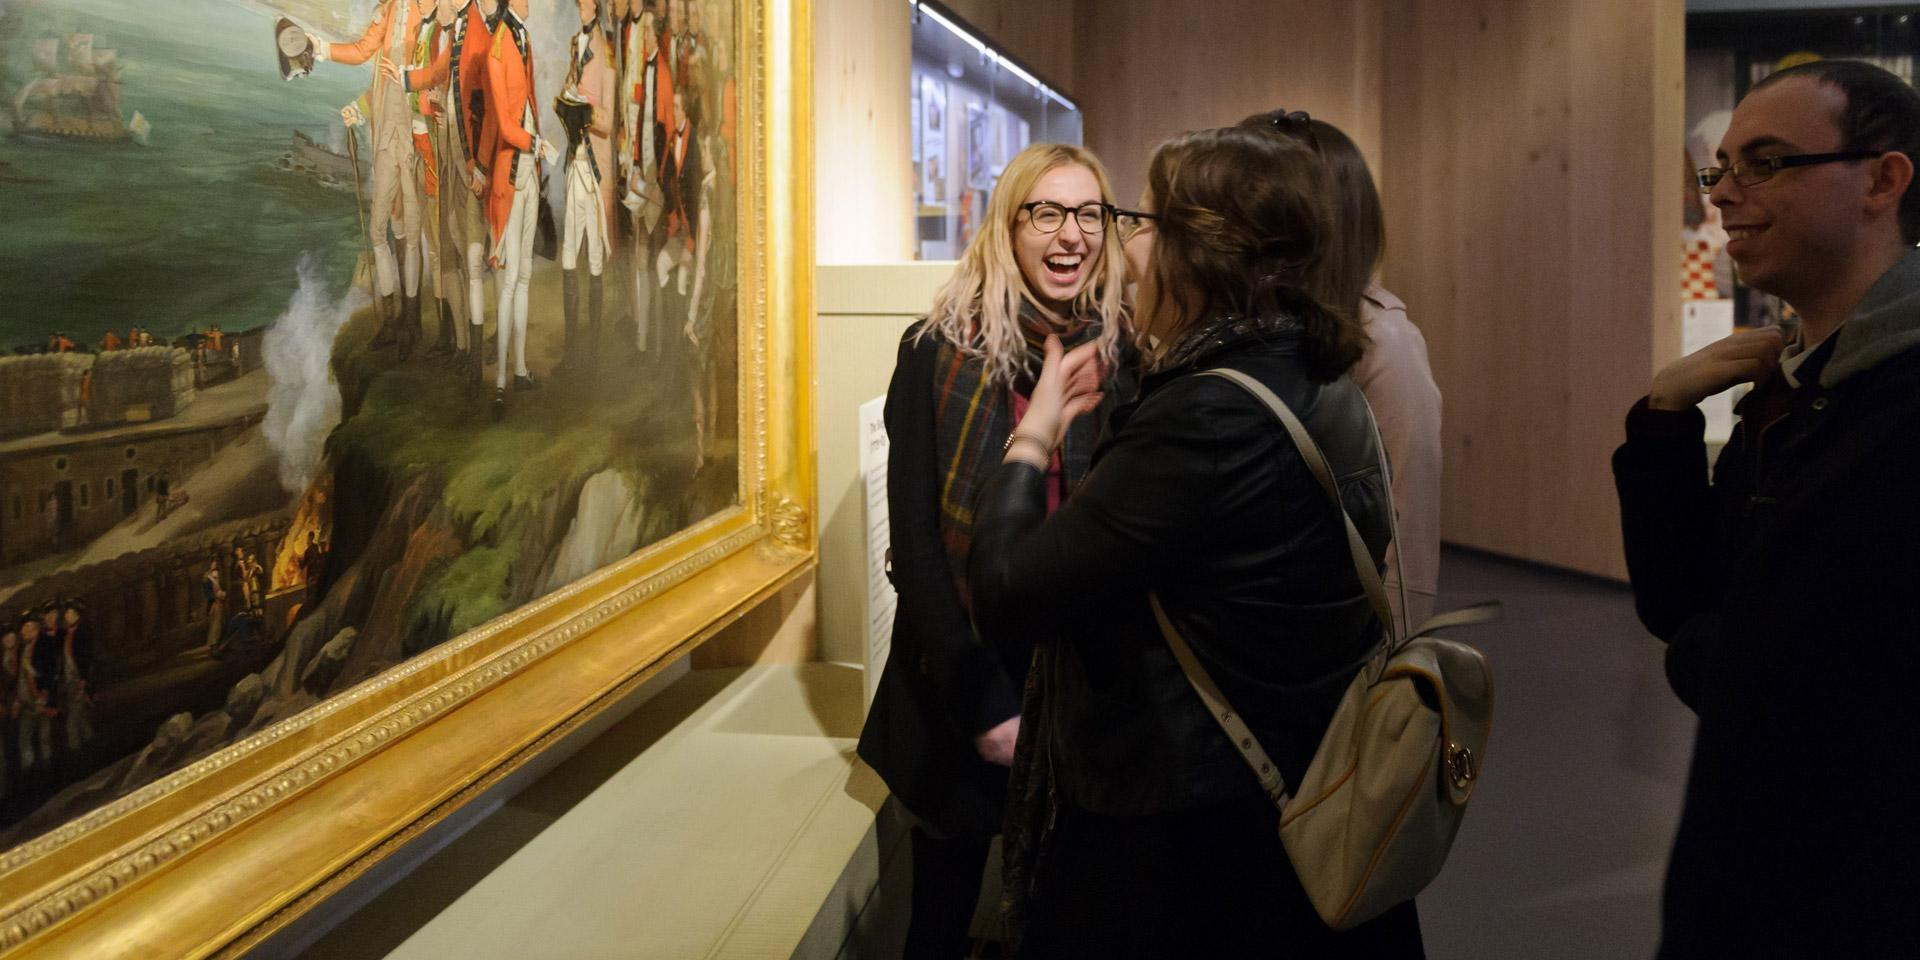 Visitors having fun in the galleries